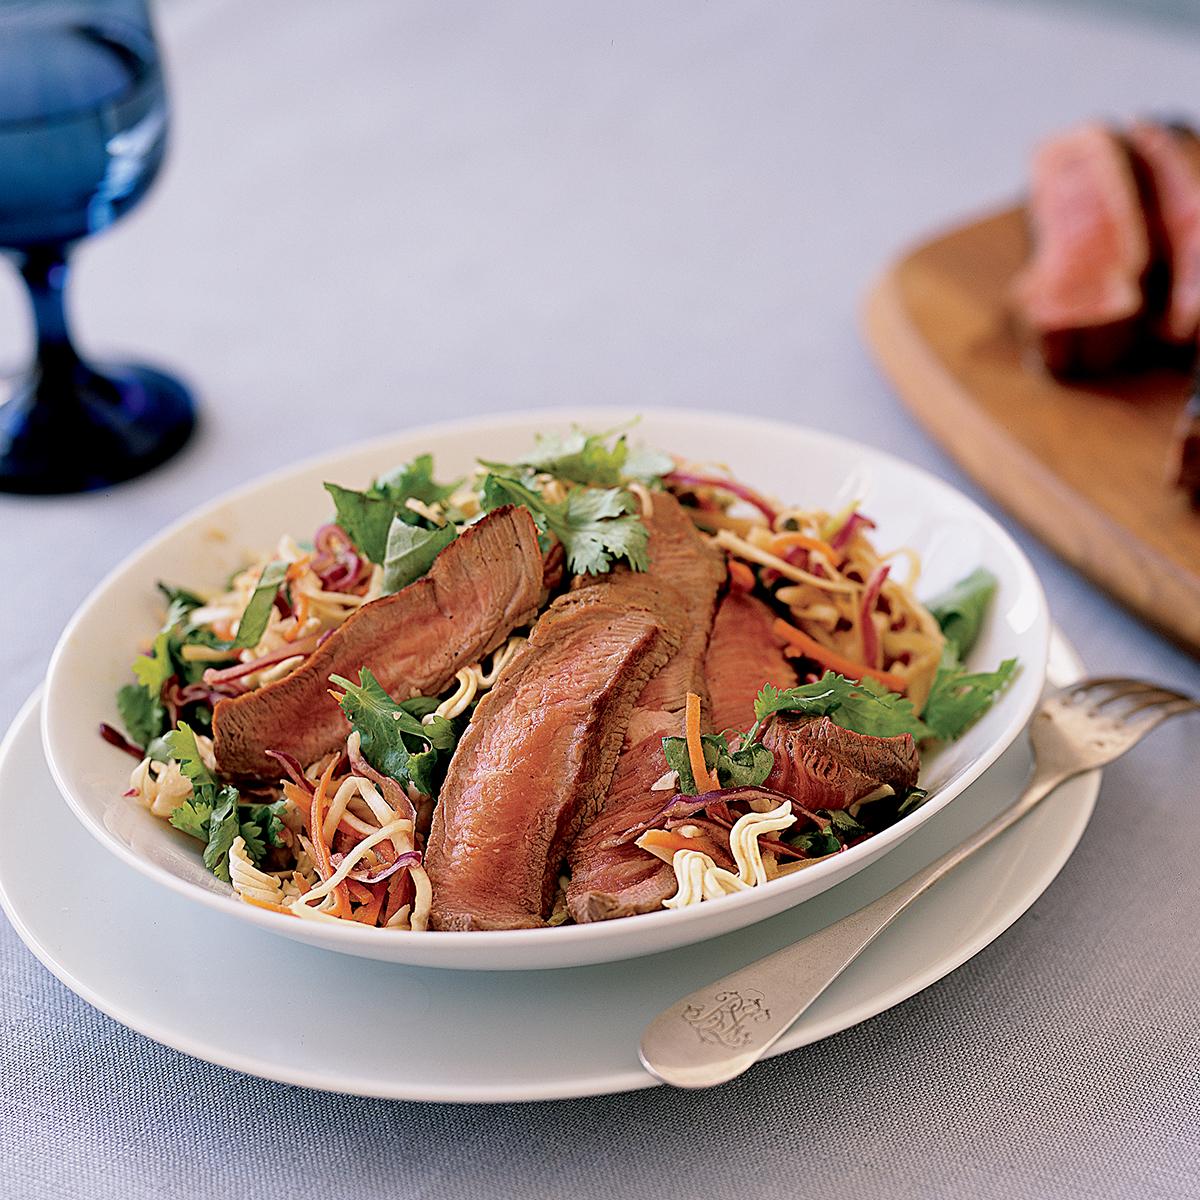 Thai Beef Salad with Crispy Noodles